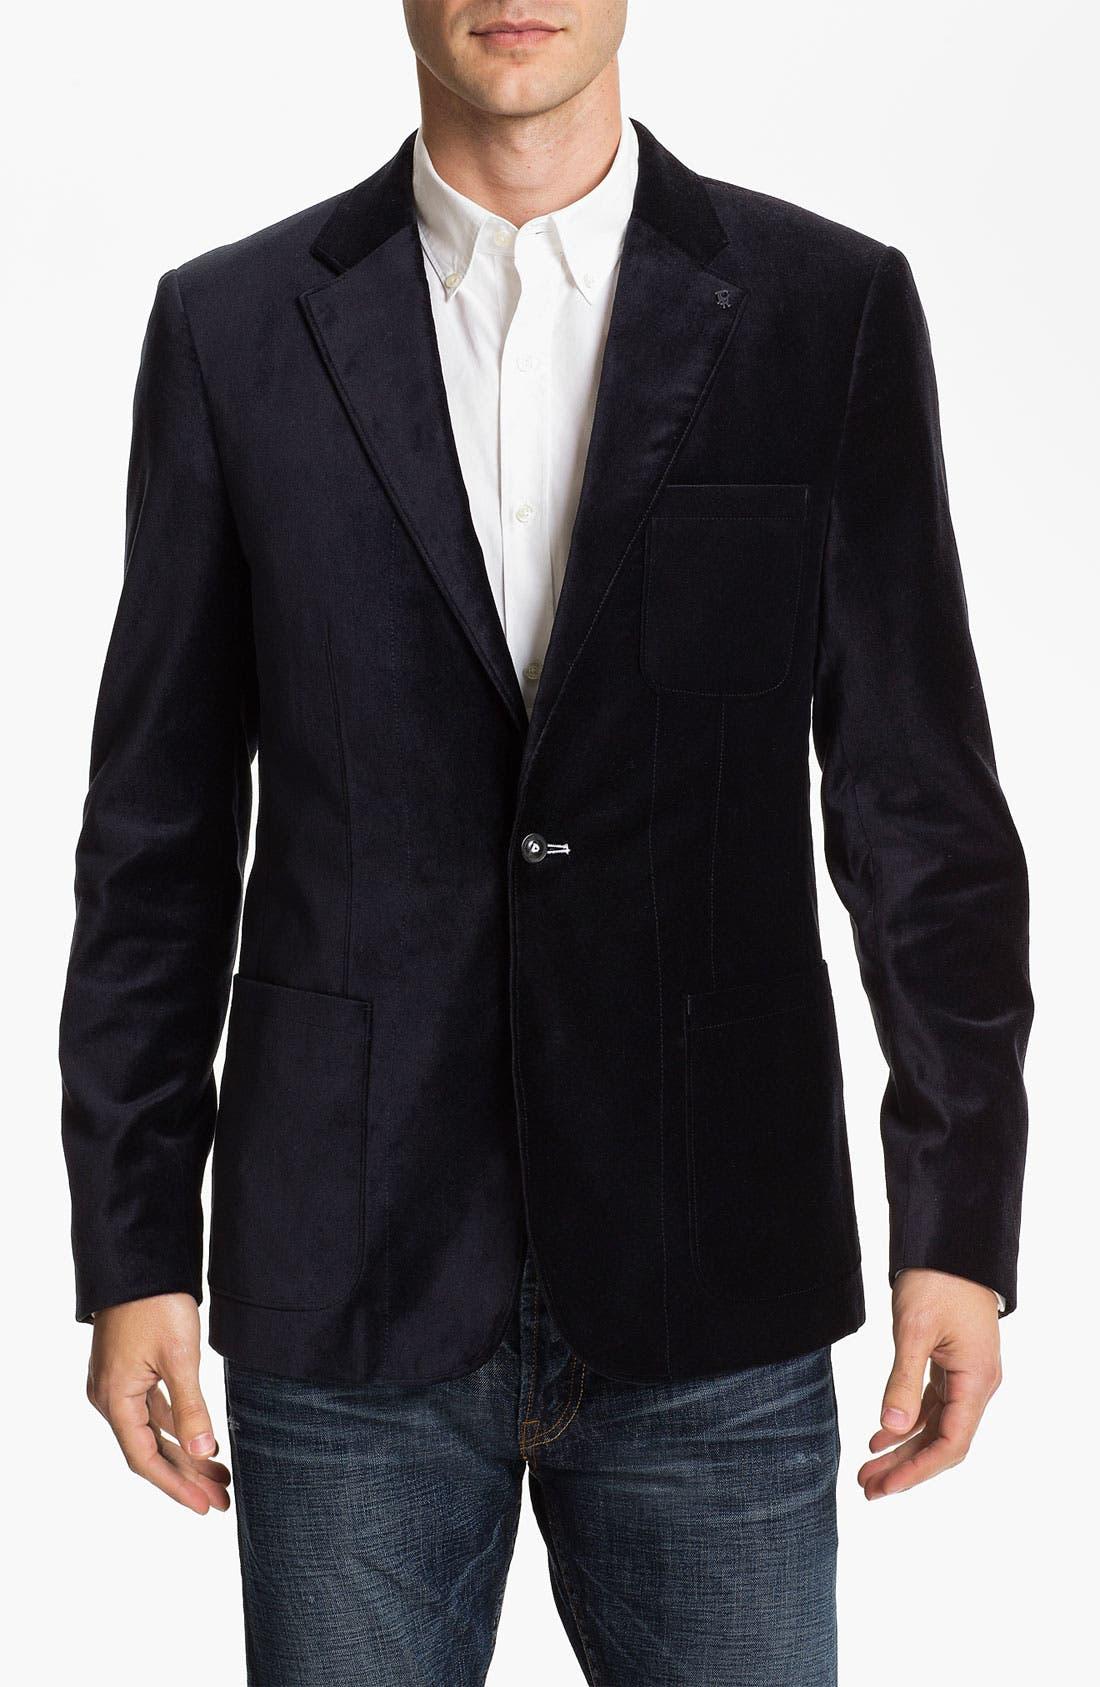 Main Image - J.C. Rags Extra Trim Fit Velvet Blazer